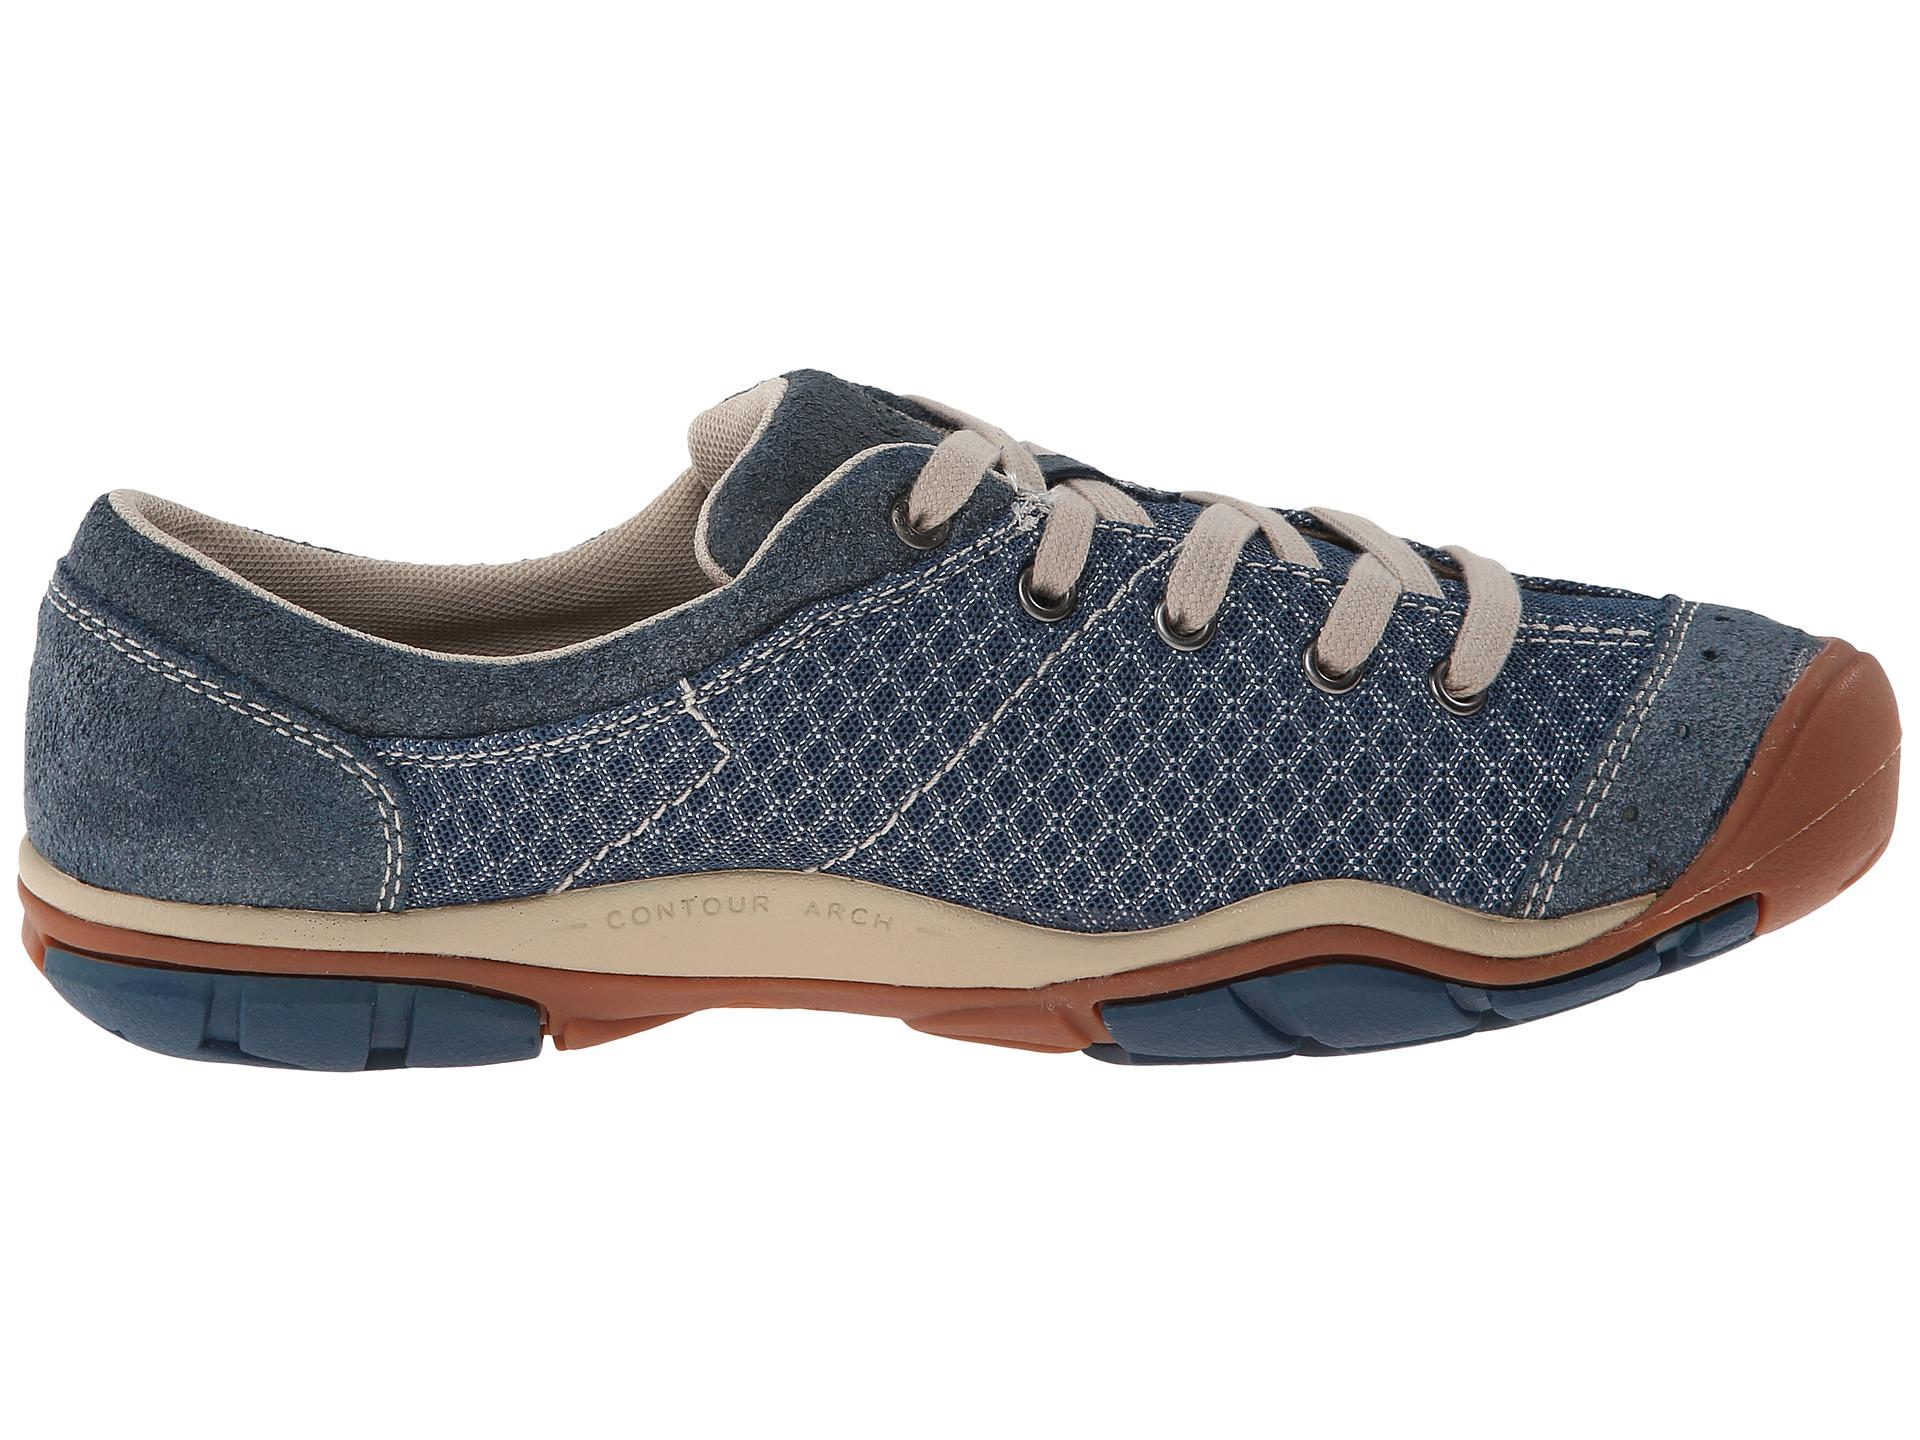 Keen Mercer Lace Cnx Shoes Women